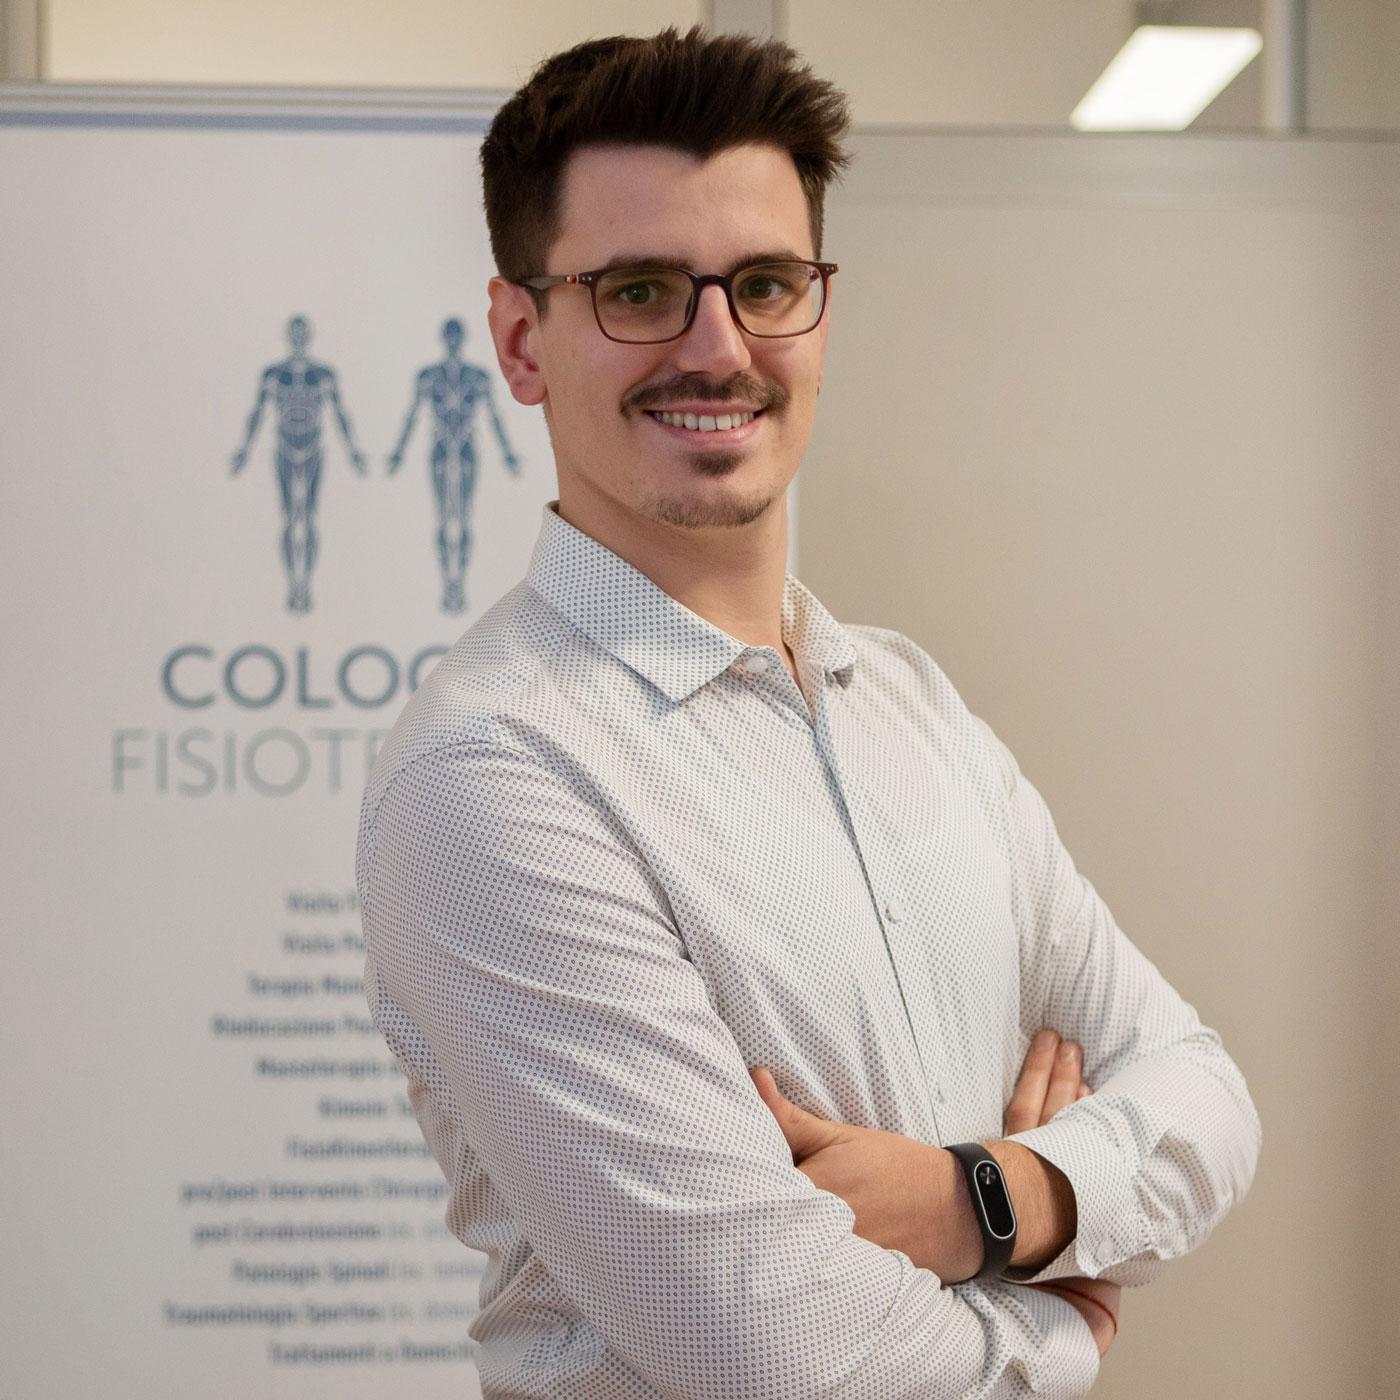 Riccardo Natali - Cologna Fisioterapia.